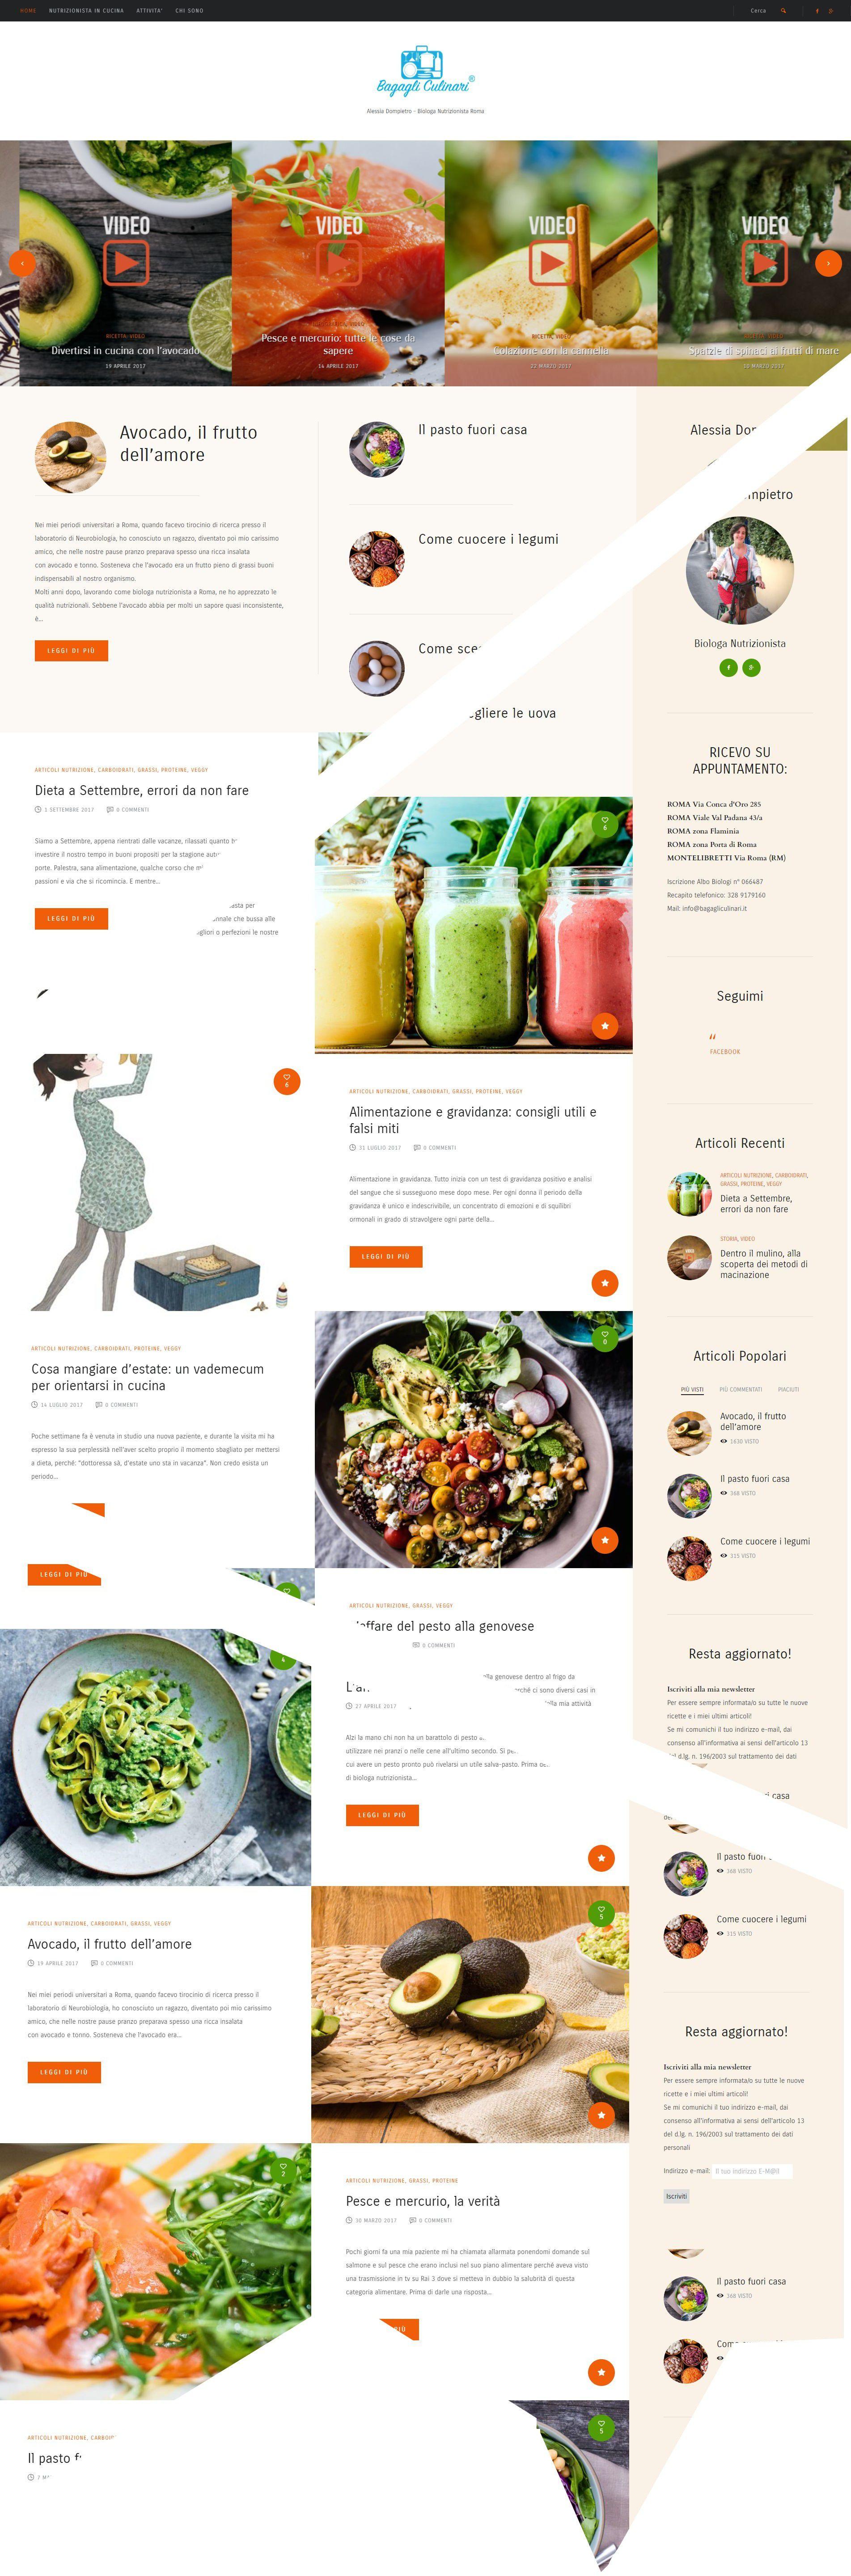 bagagli-culinari-1_compressed